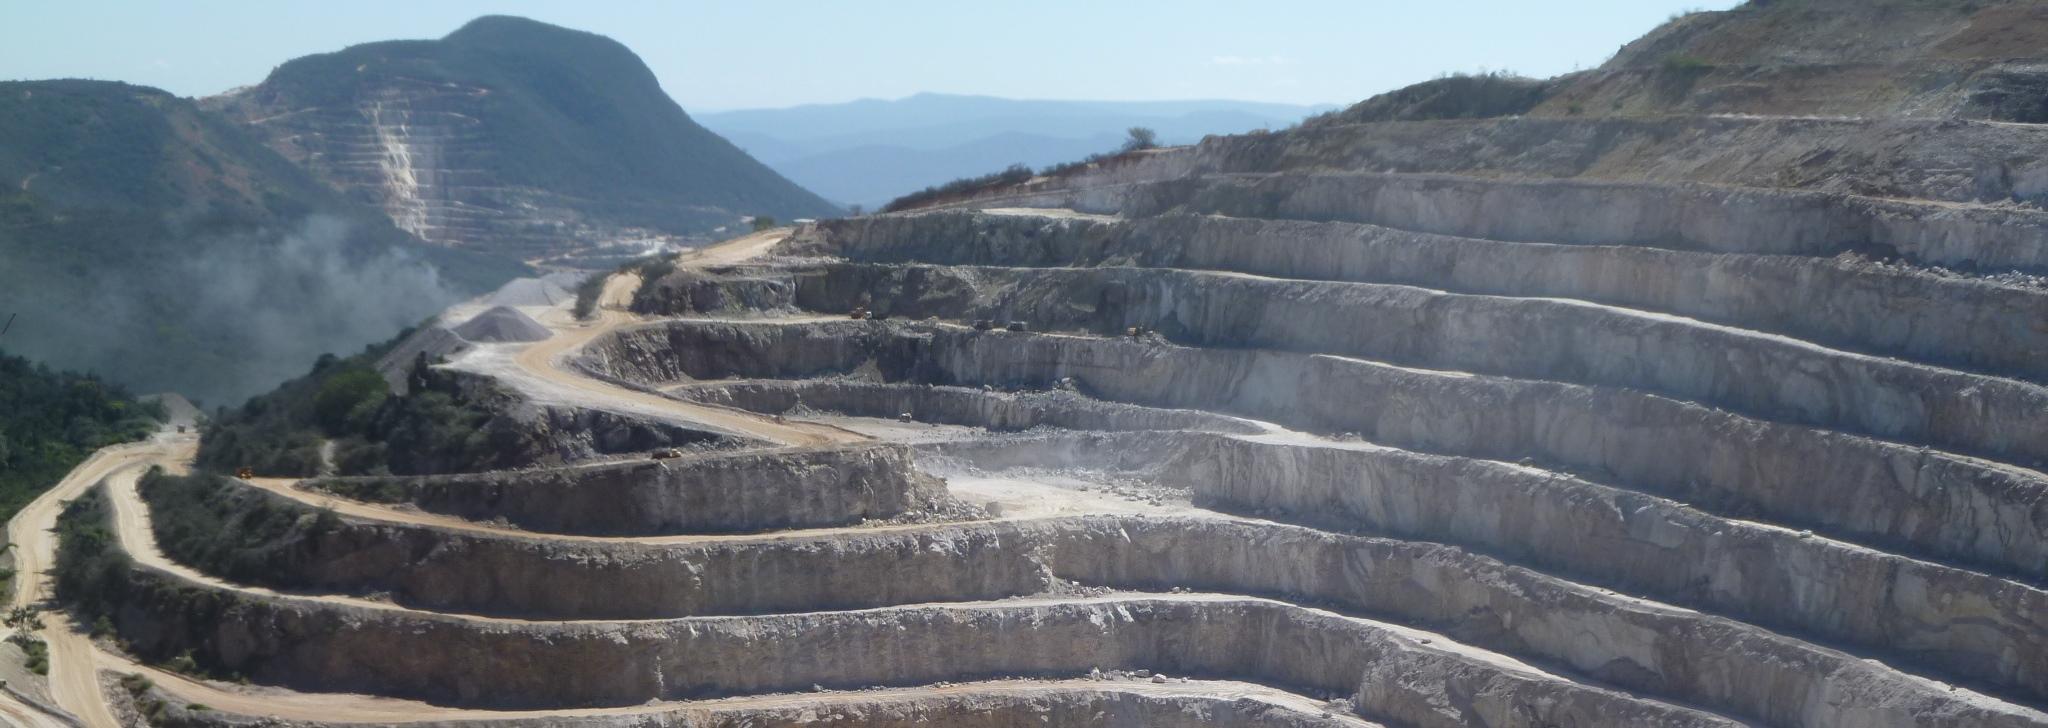 Magnesite-mine-Bahia-Brazil-2011